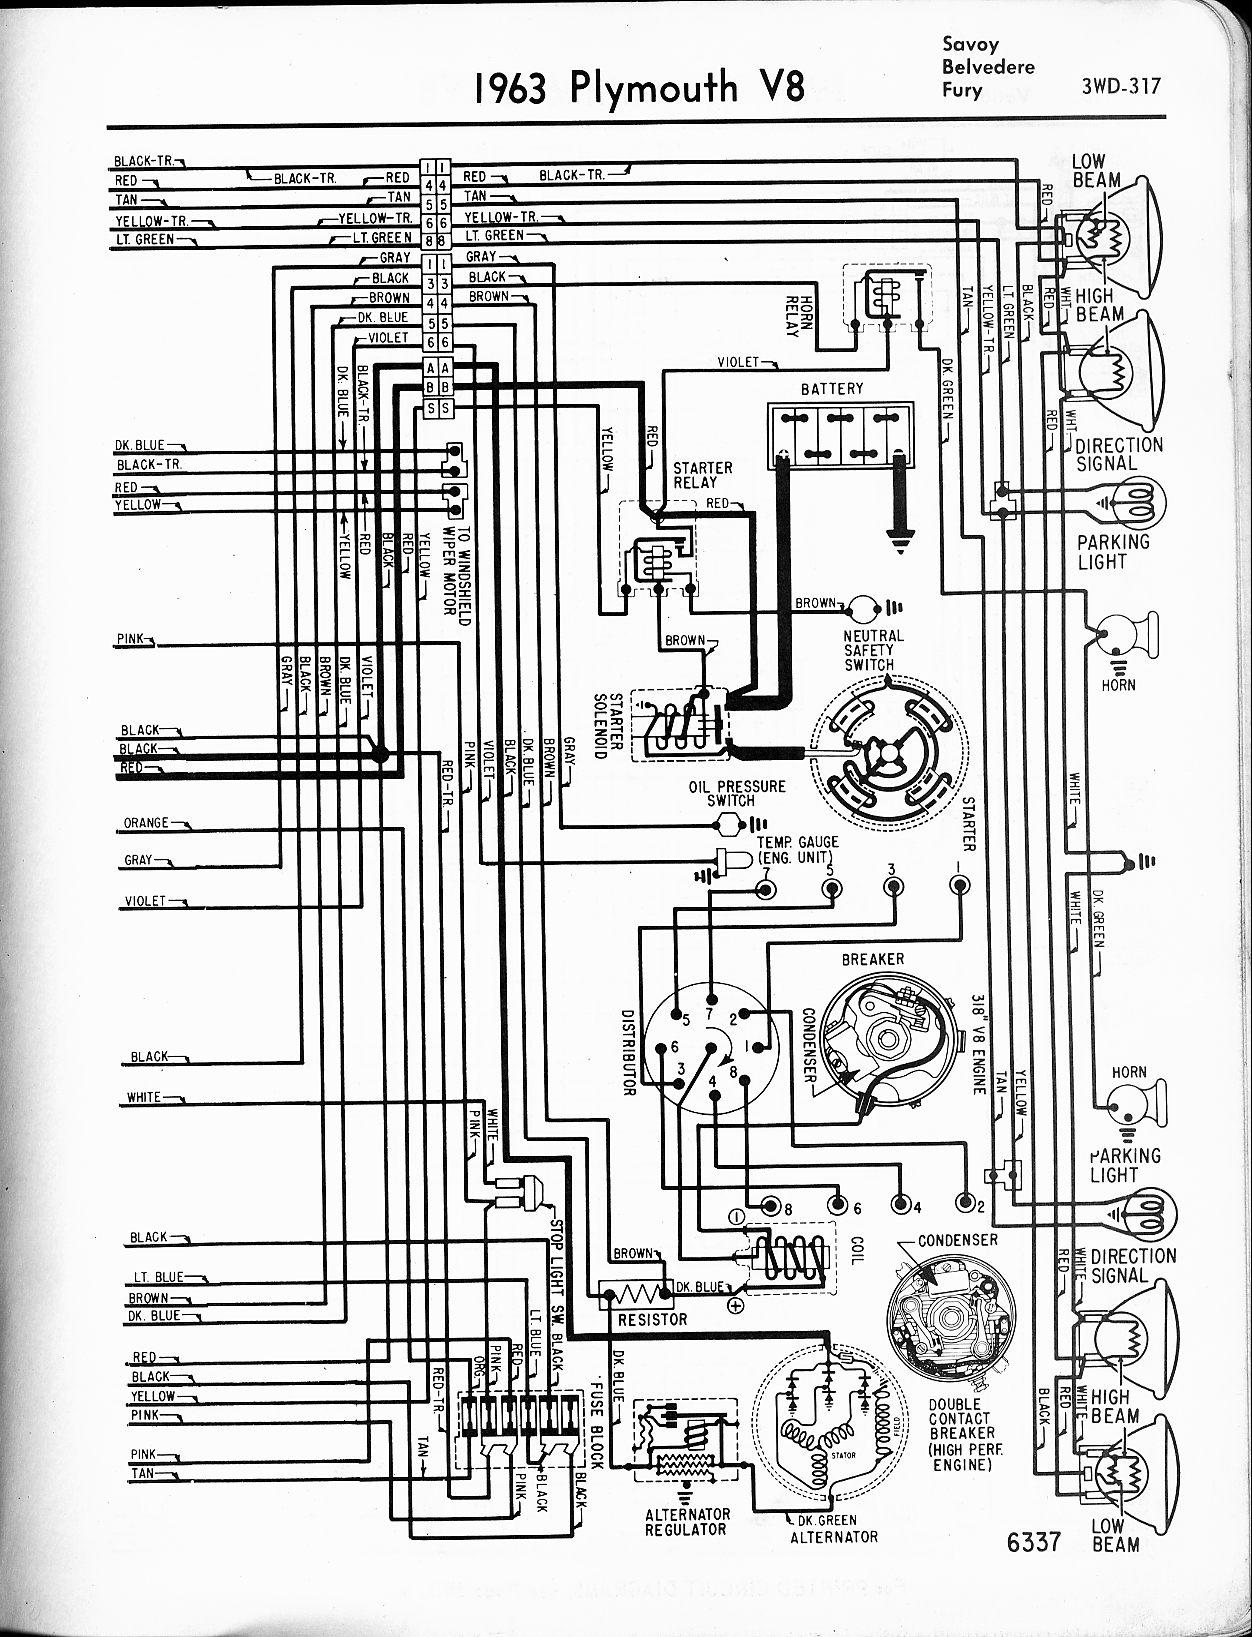 one wire alternator wiring diagram mopar acme transformers diagrams chrysler valiant library